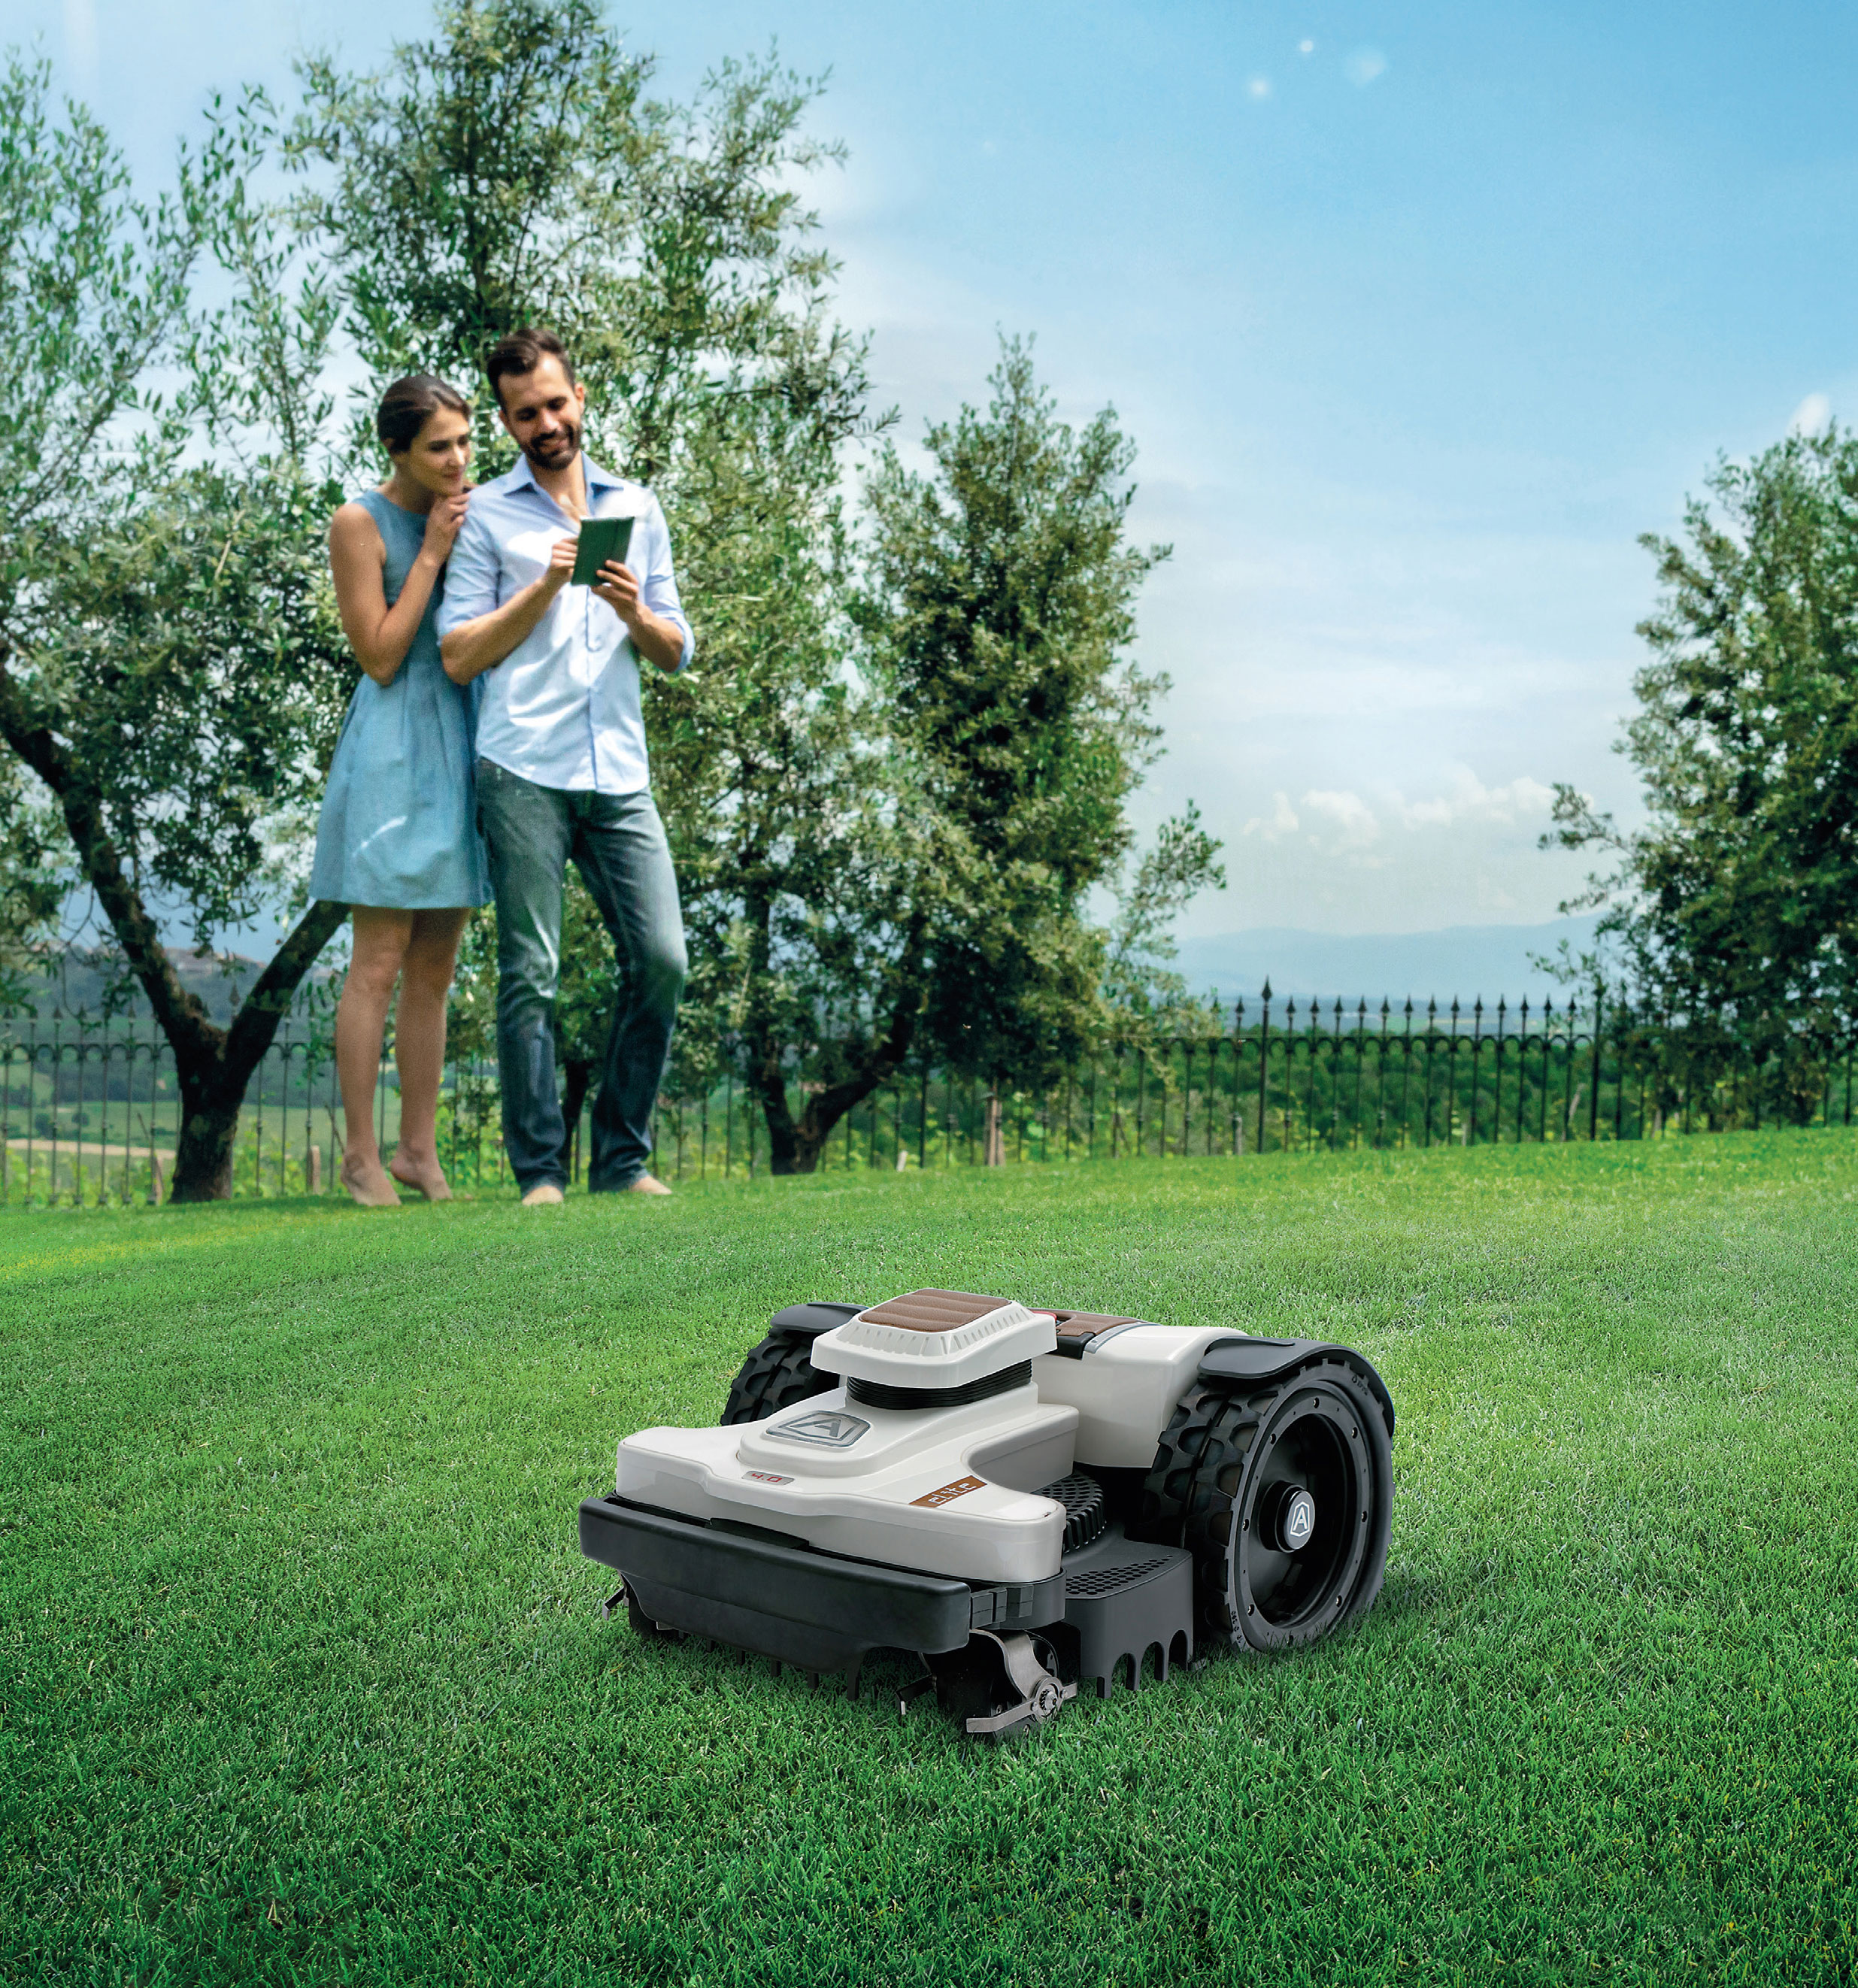 4.0-Lawn-Campaign_LR_SQR